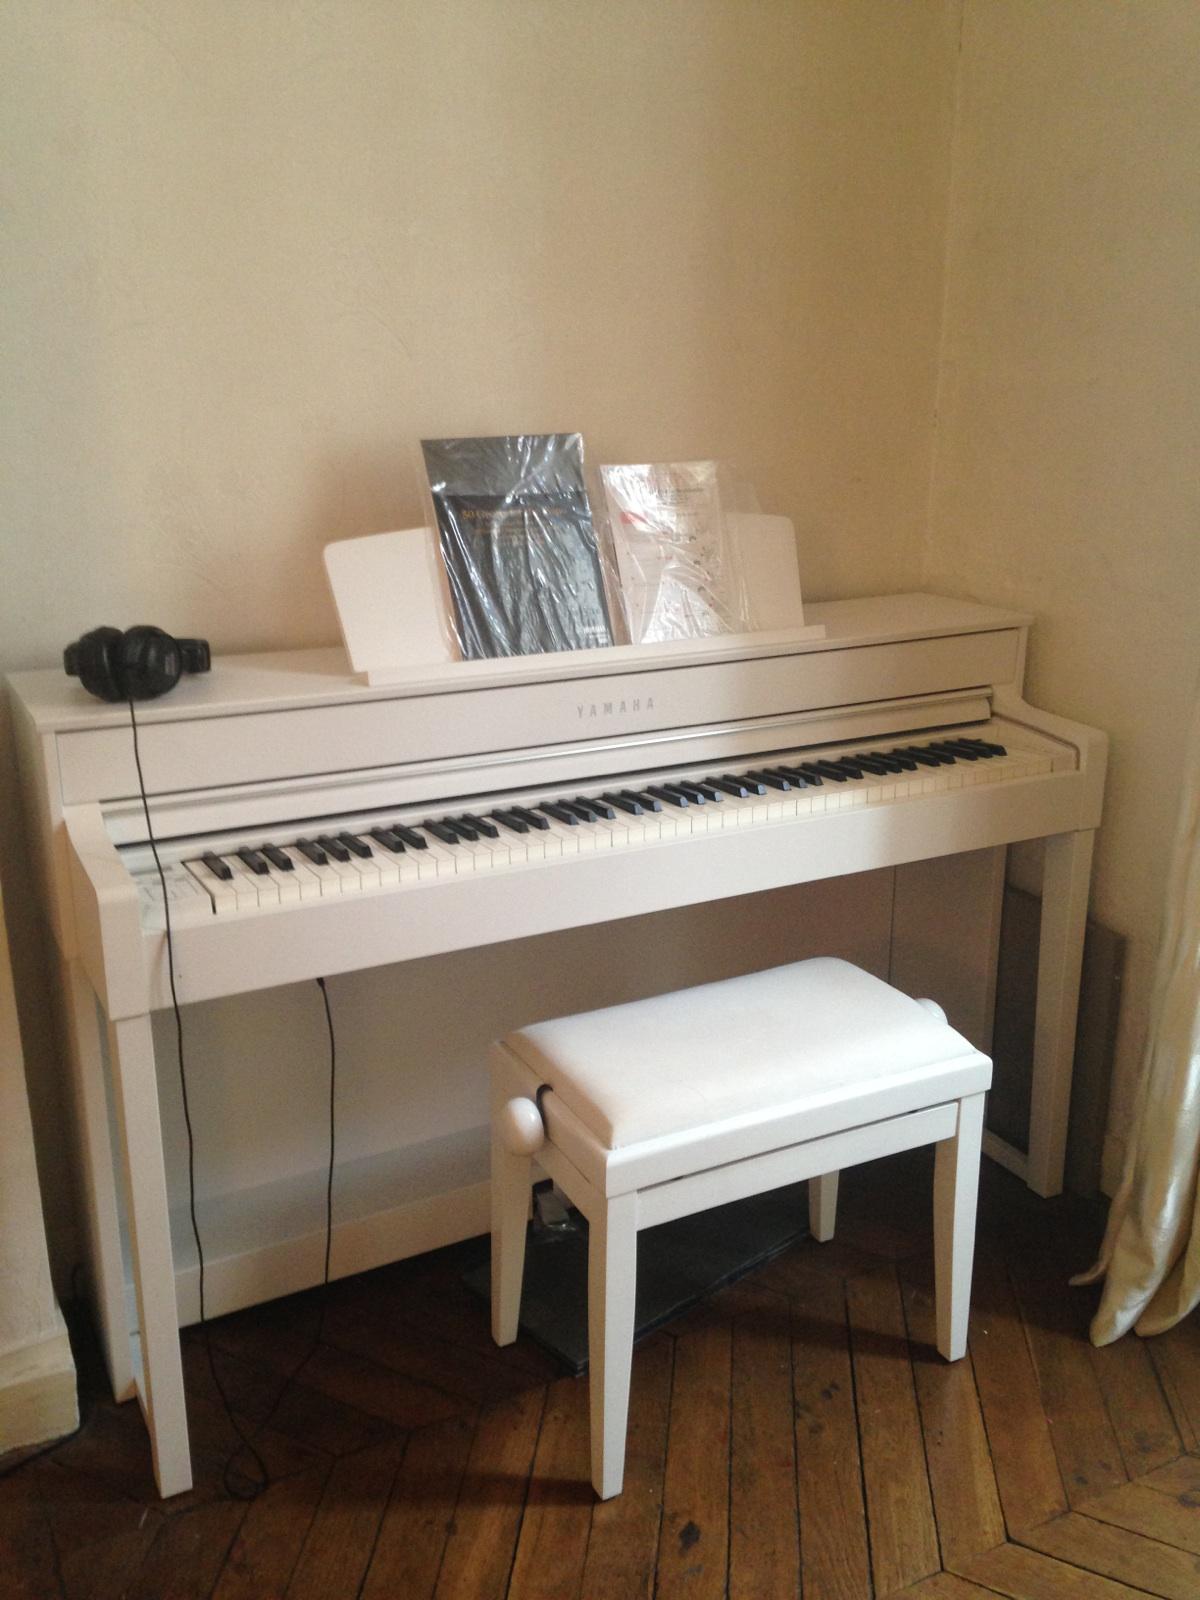 yamaha clp 545 image 933715 audiofanzine. Black Bedroom Furniture Sets. Home Design Ideas